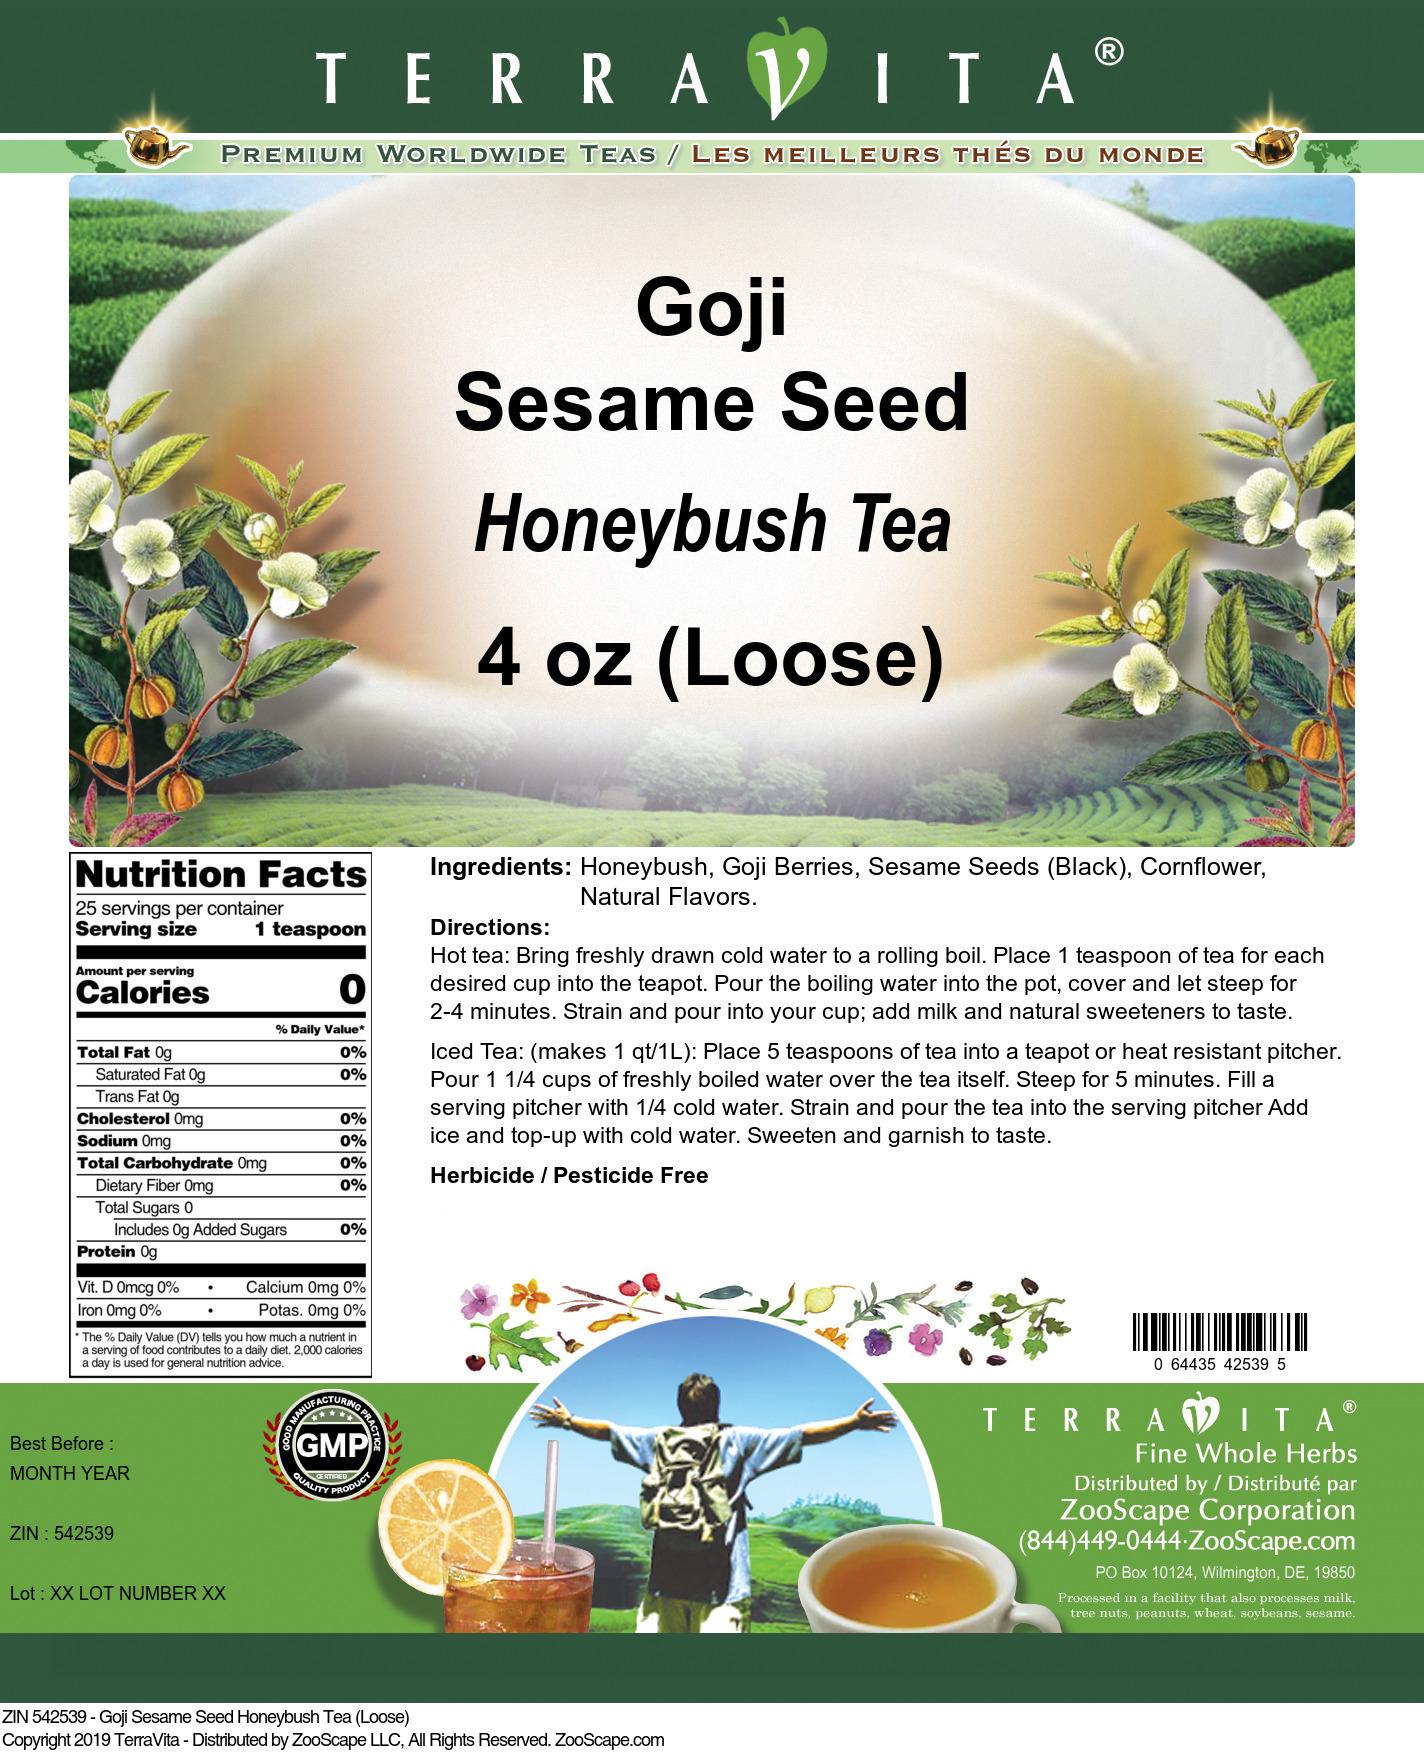 Goji Sesame Seed Honeybush Tea (Loose)